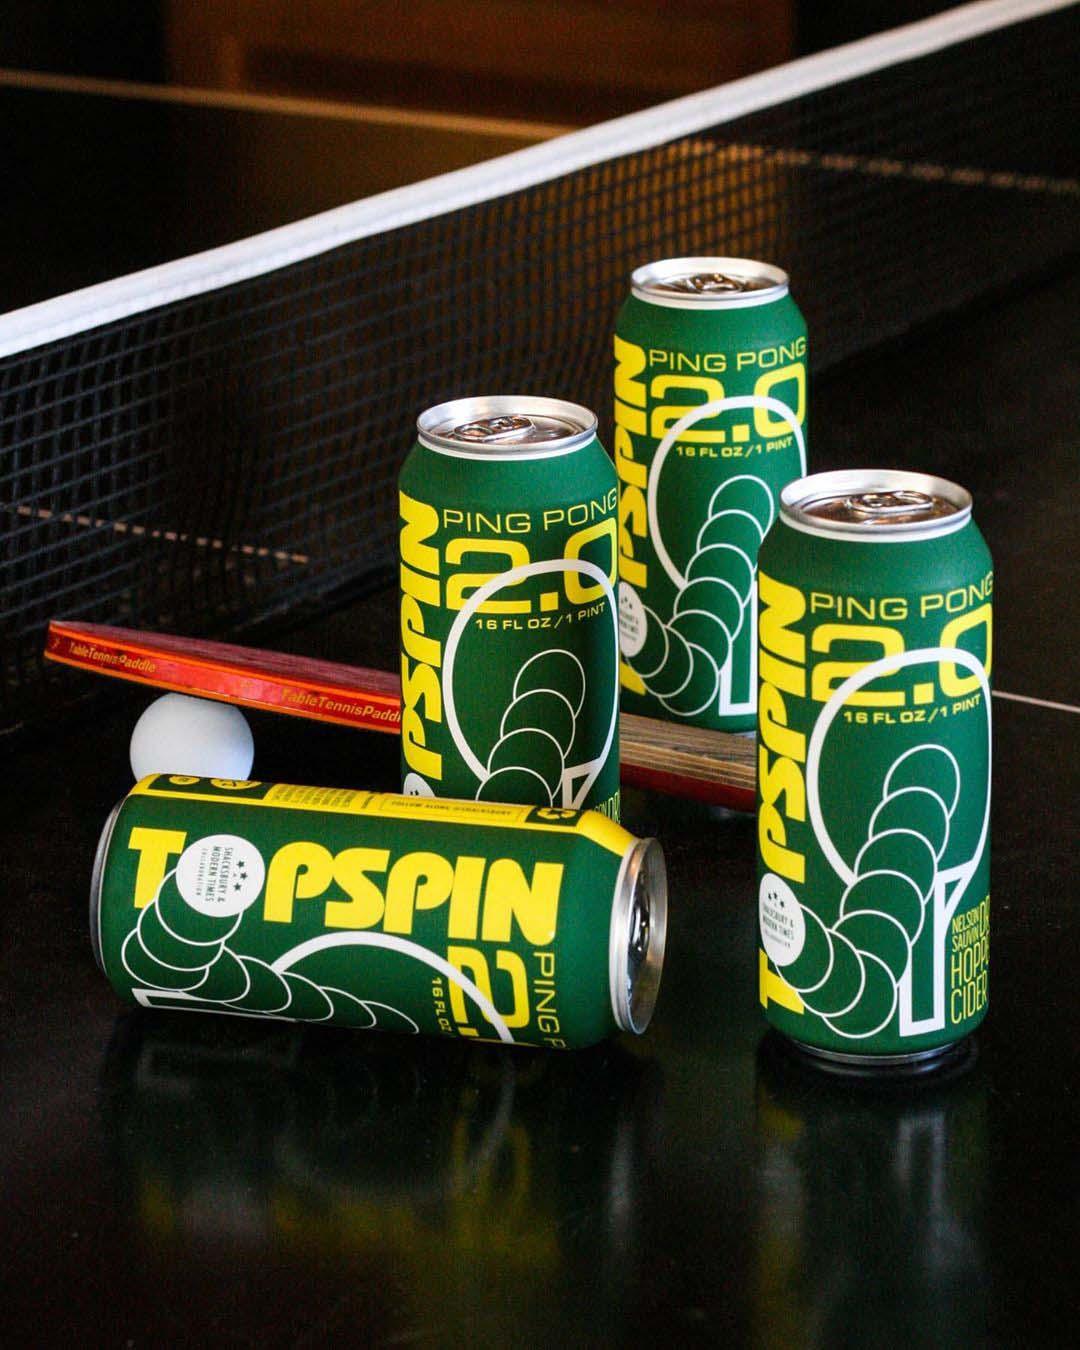 Shacksbury Cider x Modern Times Beer, Topspin Ping Pong 2.0